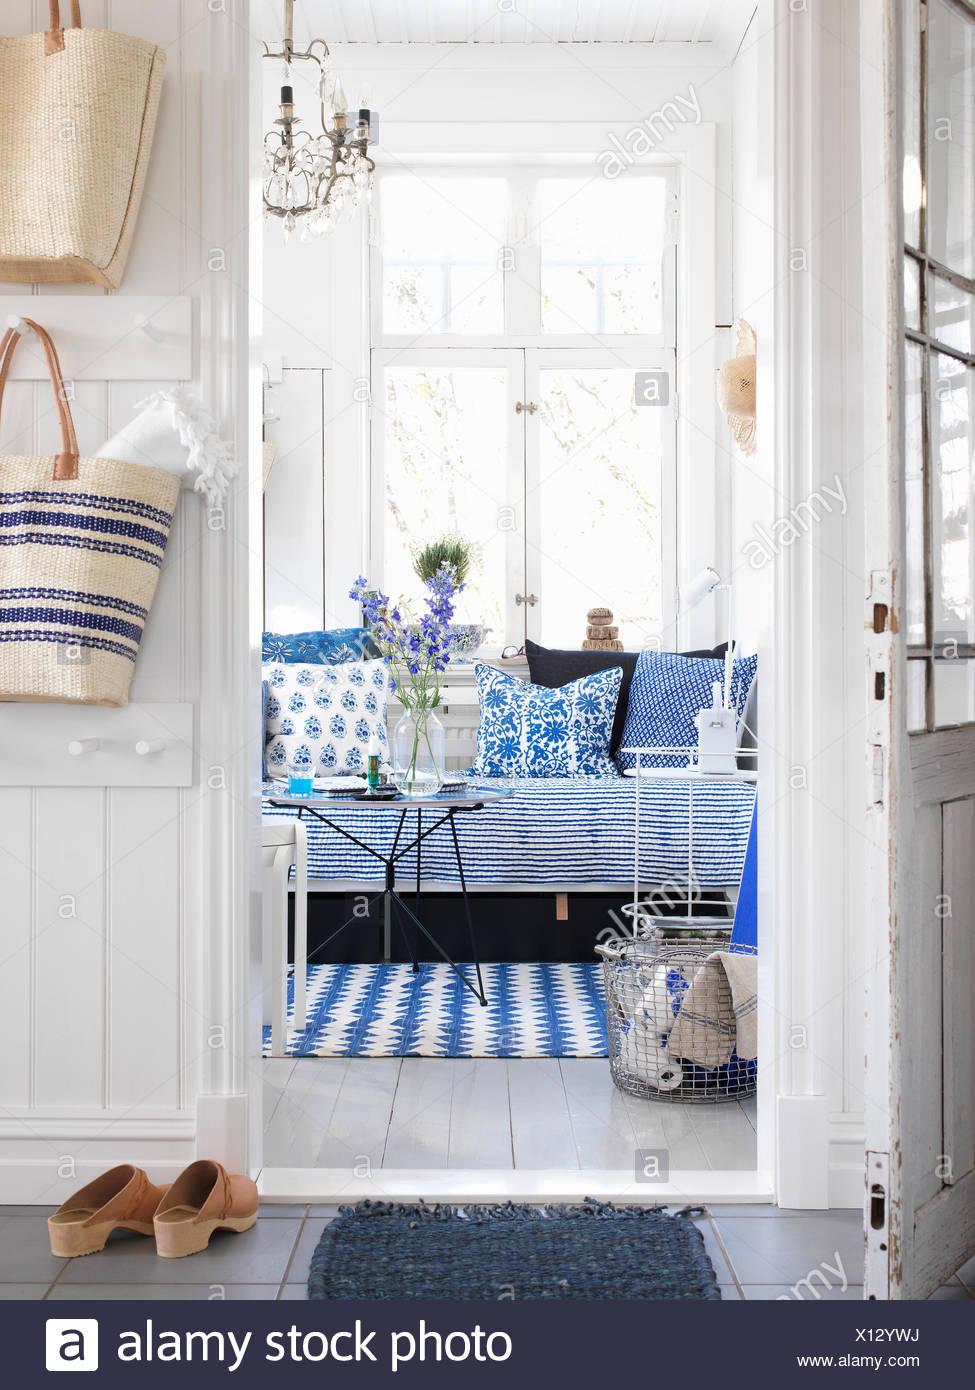 Sweden, Vastergotland, View of home interior - Stock Image